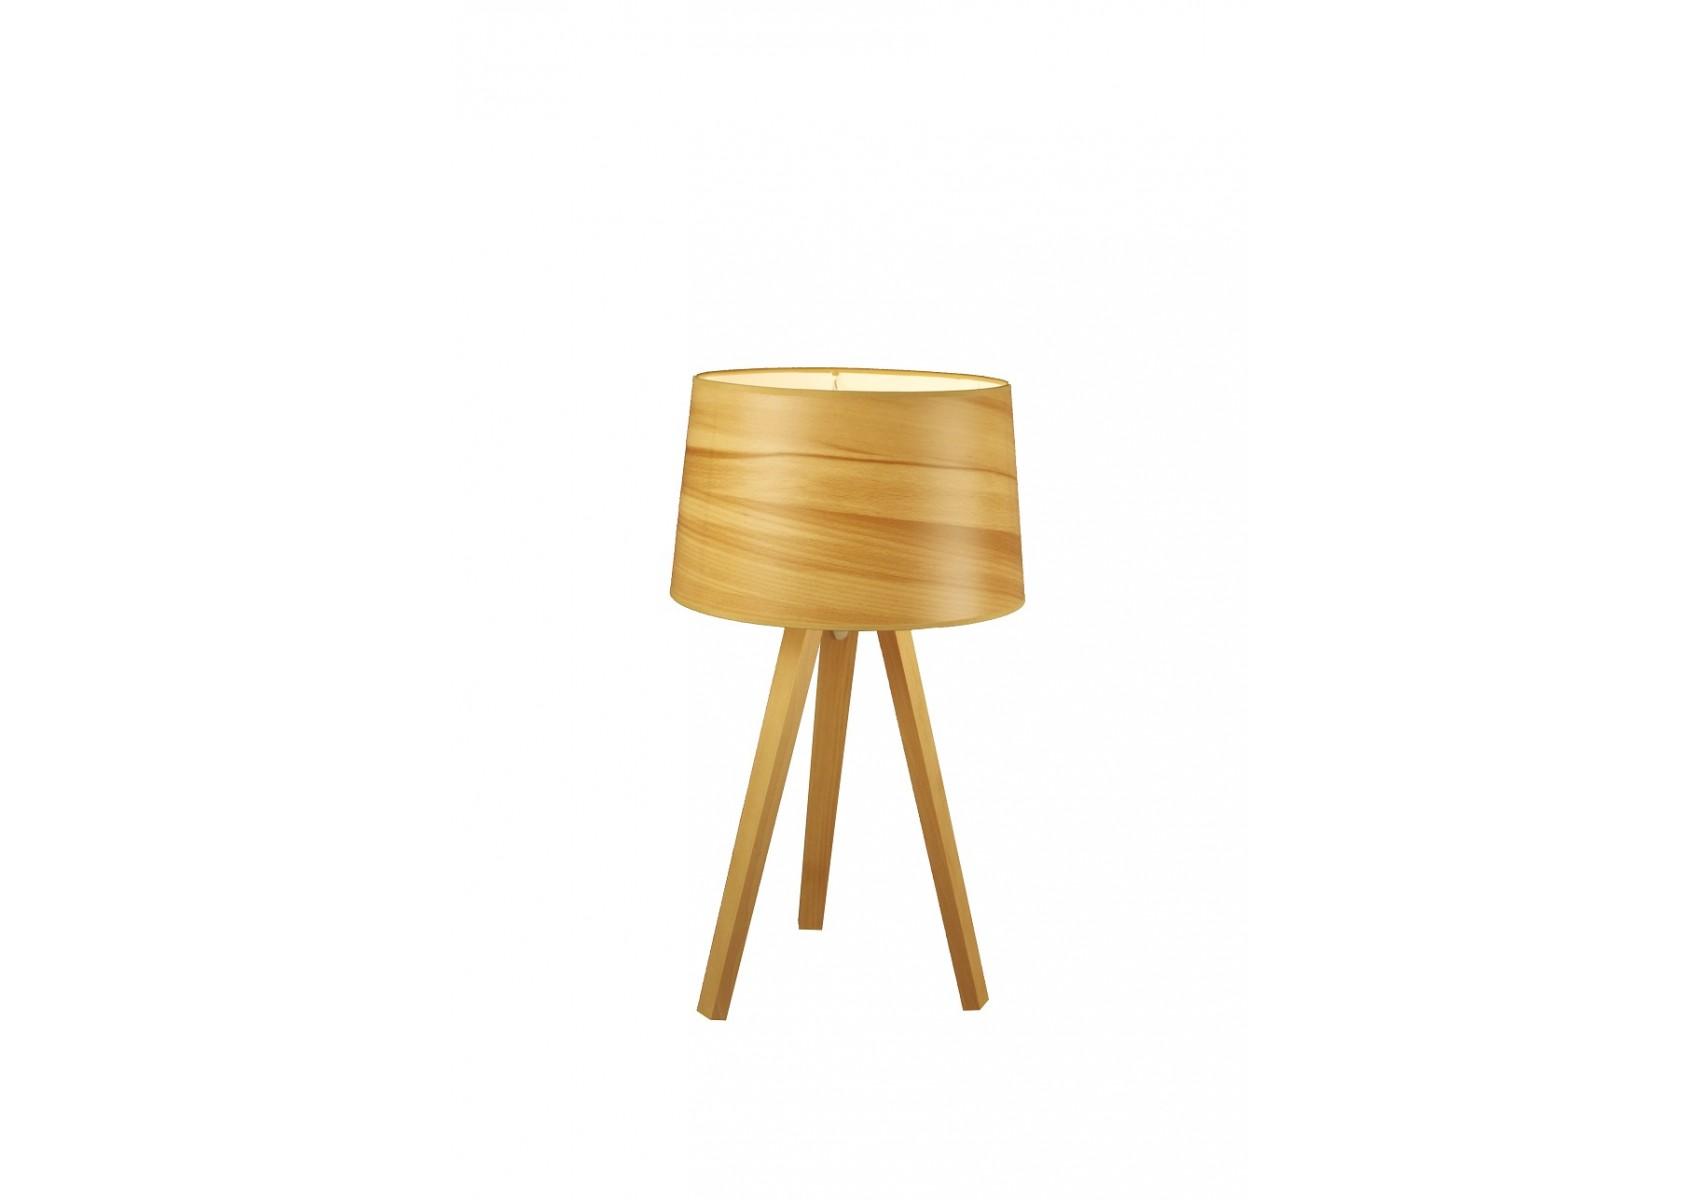 lampe tr pied en bois essence par aluminor. Black Bedroom Furniture Sets. Home Design Ideas